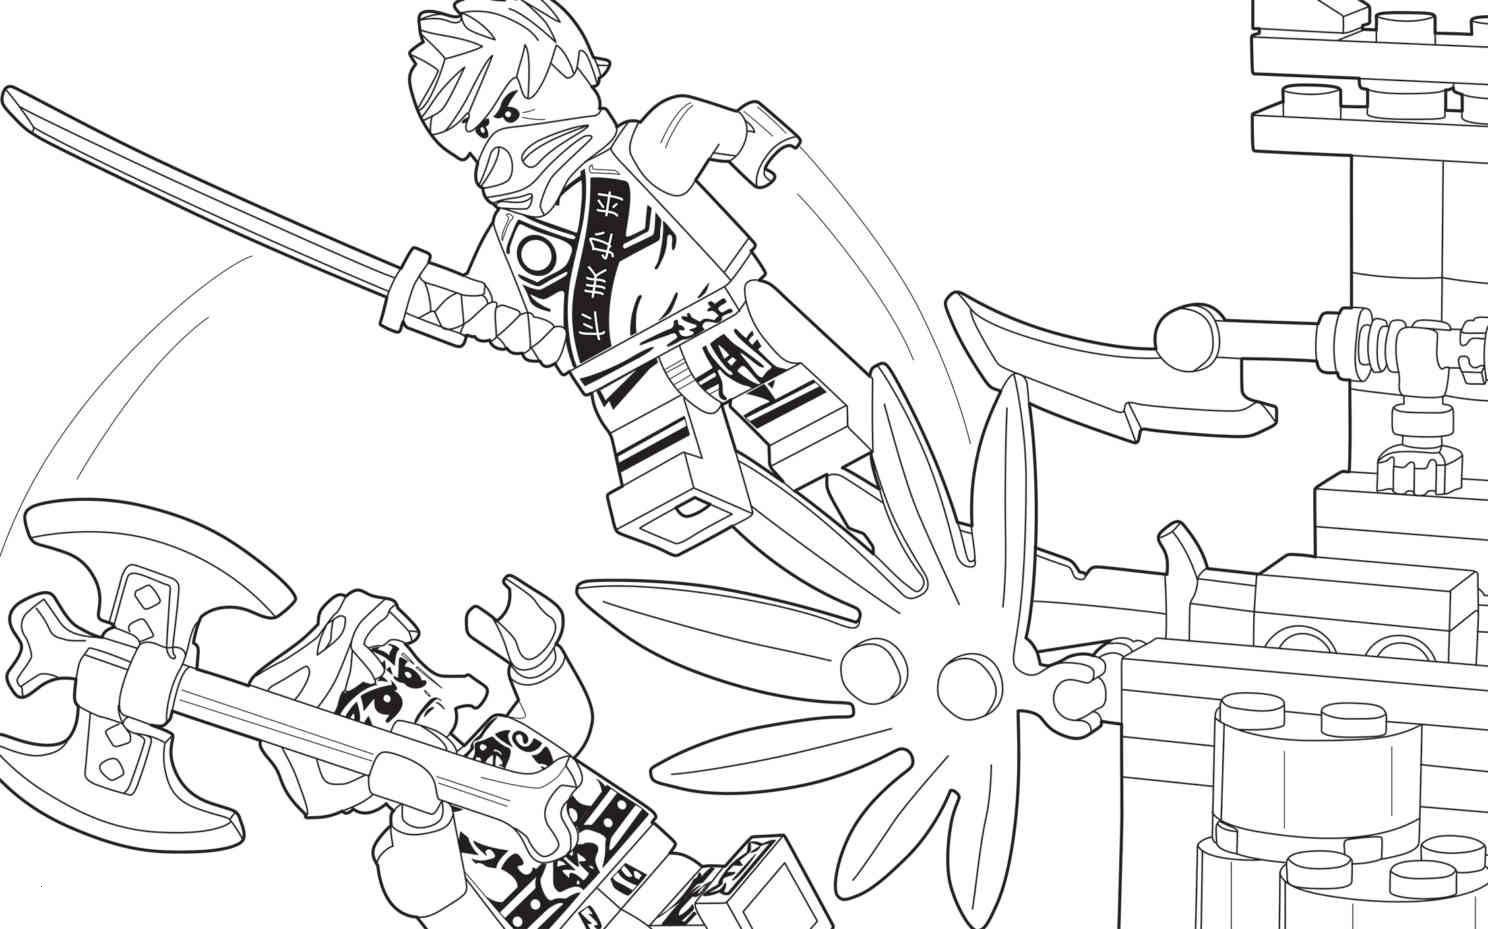 Ausmalbilder Ninjago Lloyd Genial Ausmalbilder 1 Klasse Frisch 37 Lego Ninjago Lloyd Ausmalbilder Stock